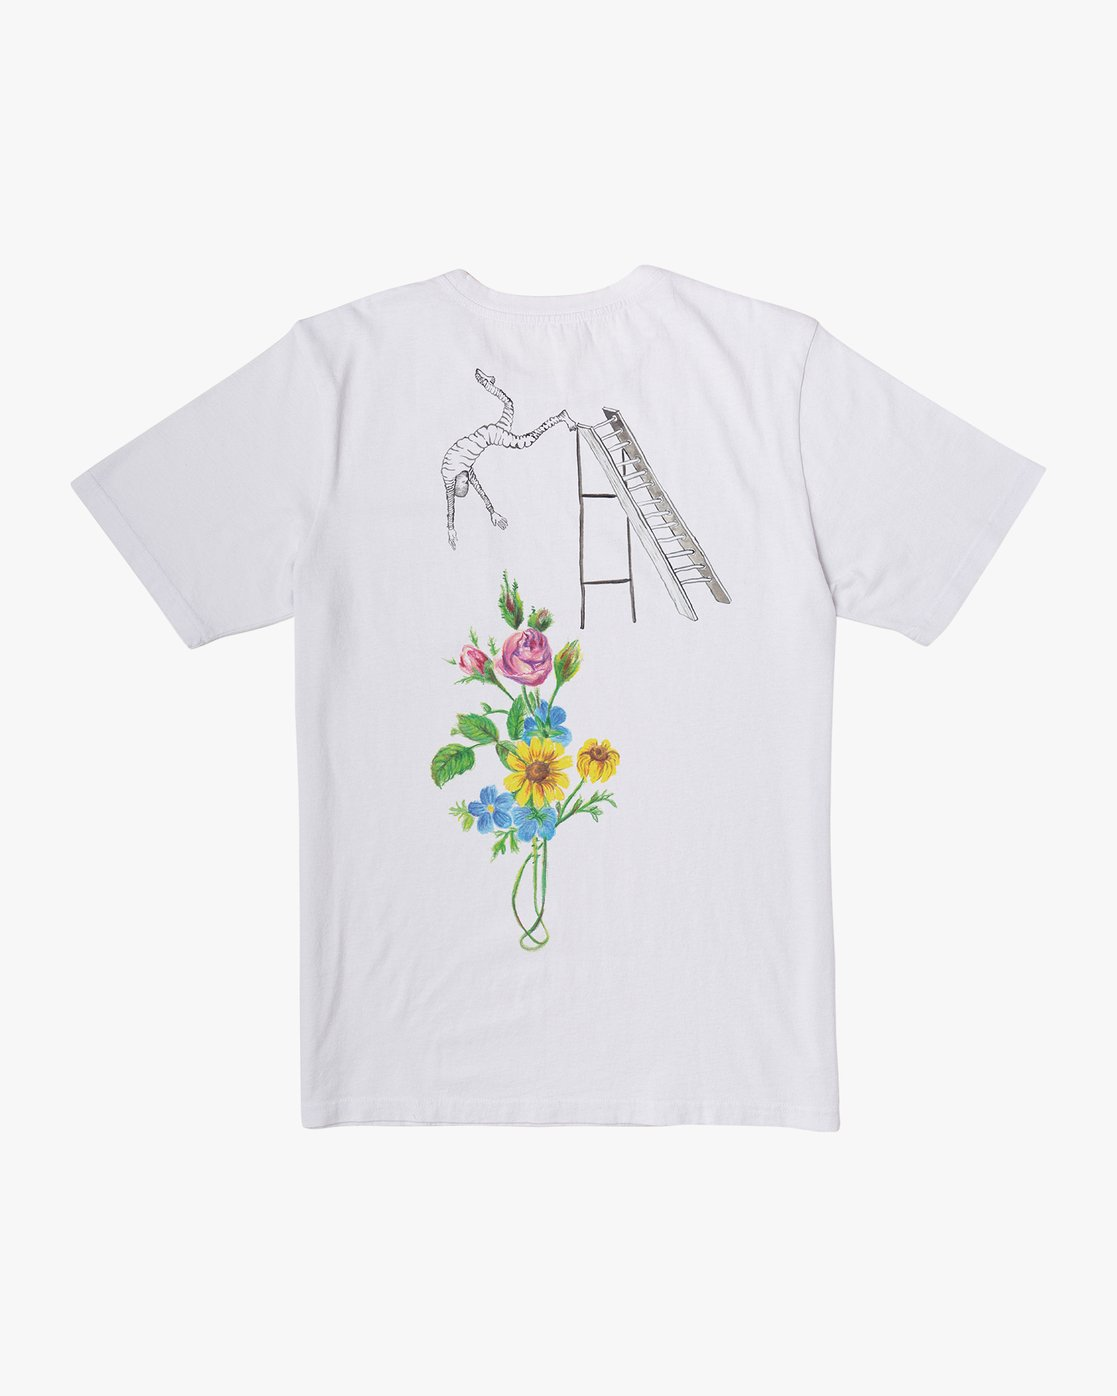 0 Spanky Sketchbook T-Shirt White M441WRSK RVCA